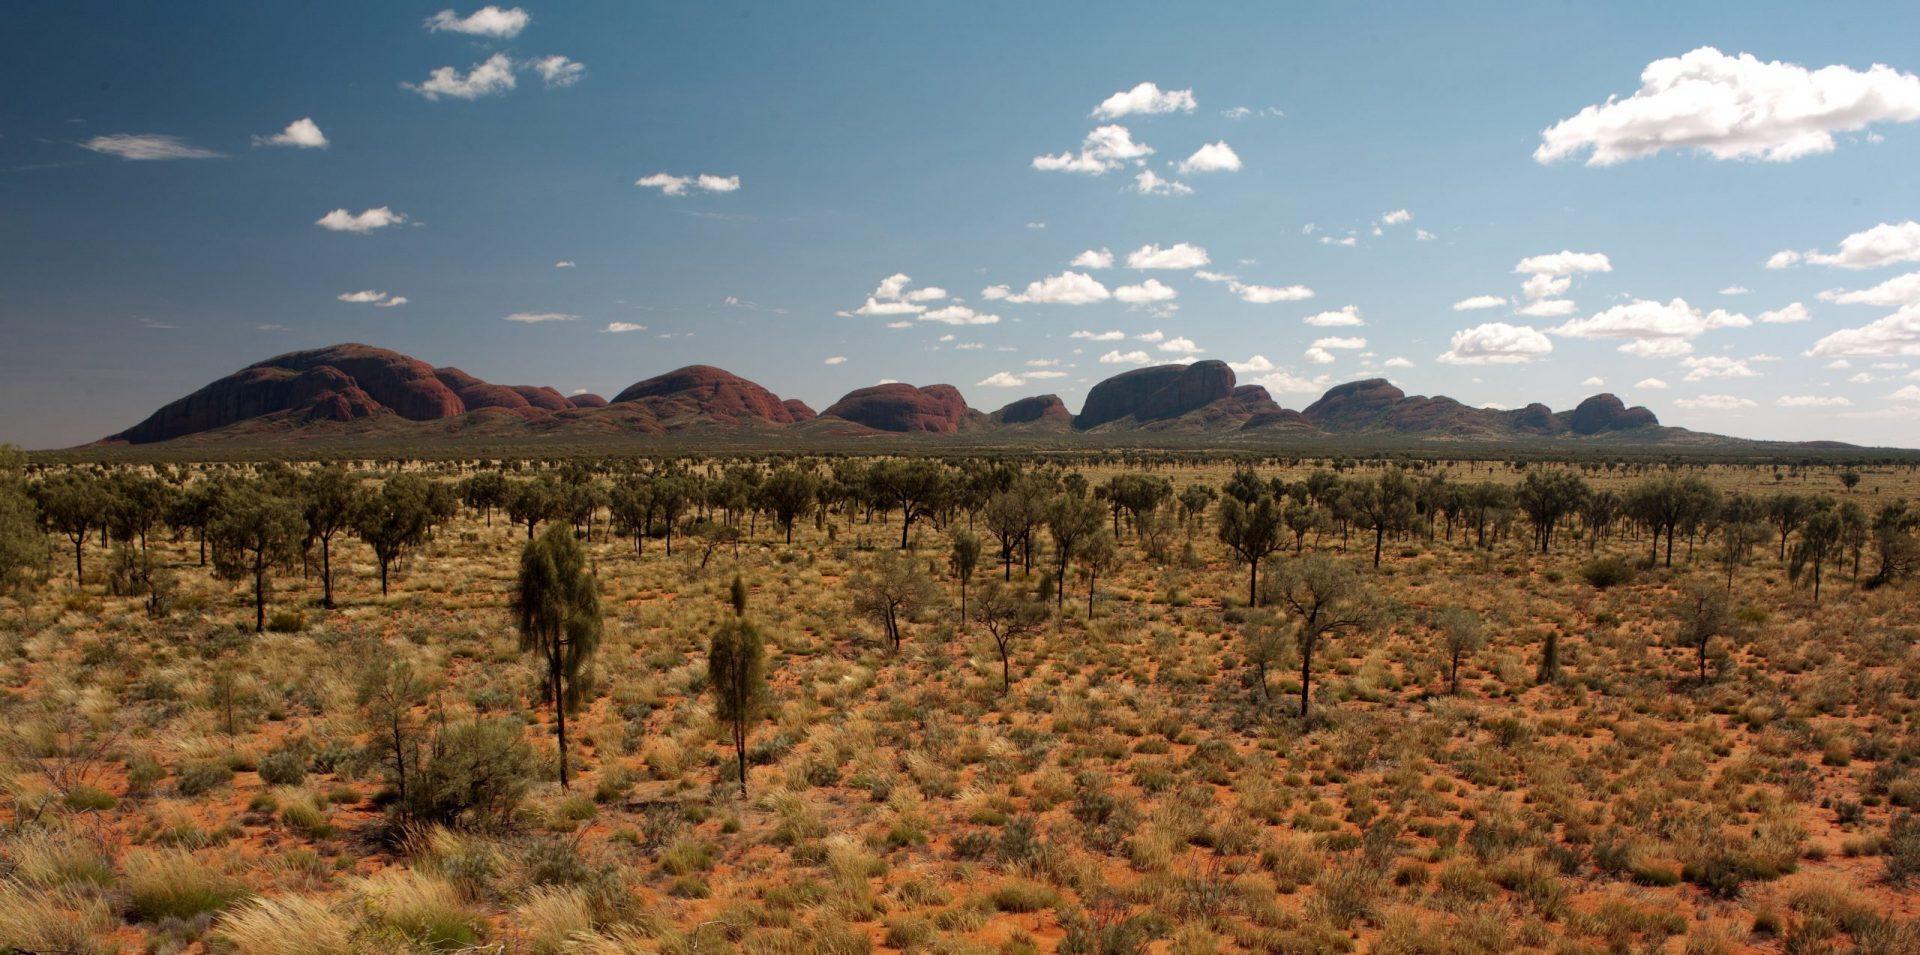 Kata Tjuta, Uluru Kata Tjuta National Park